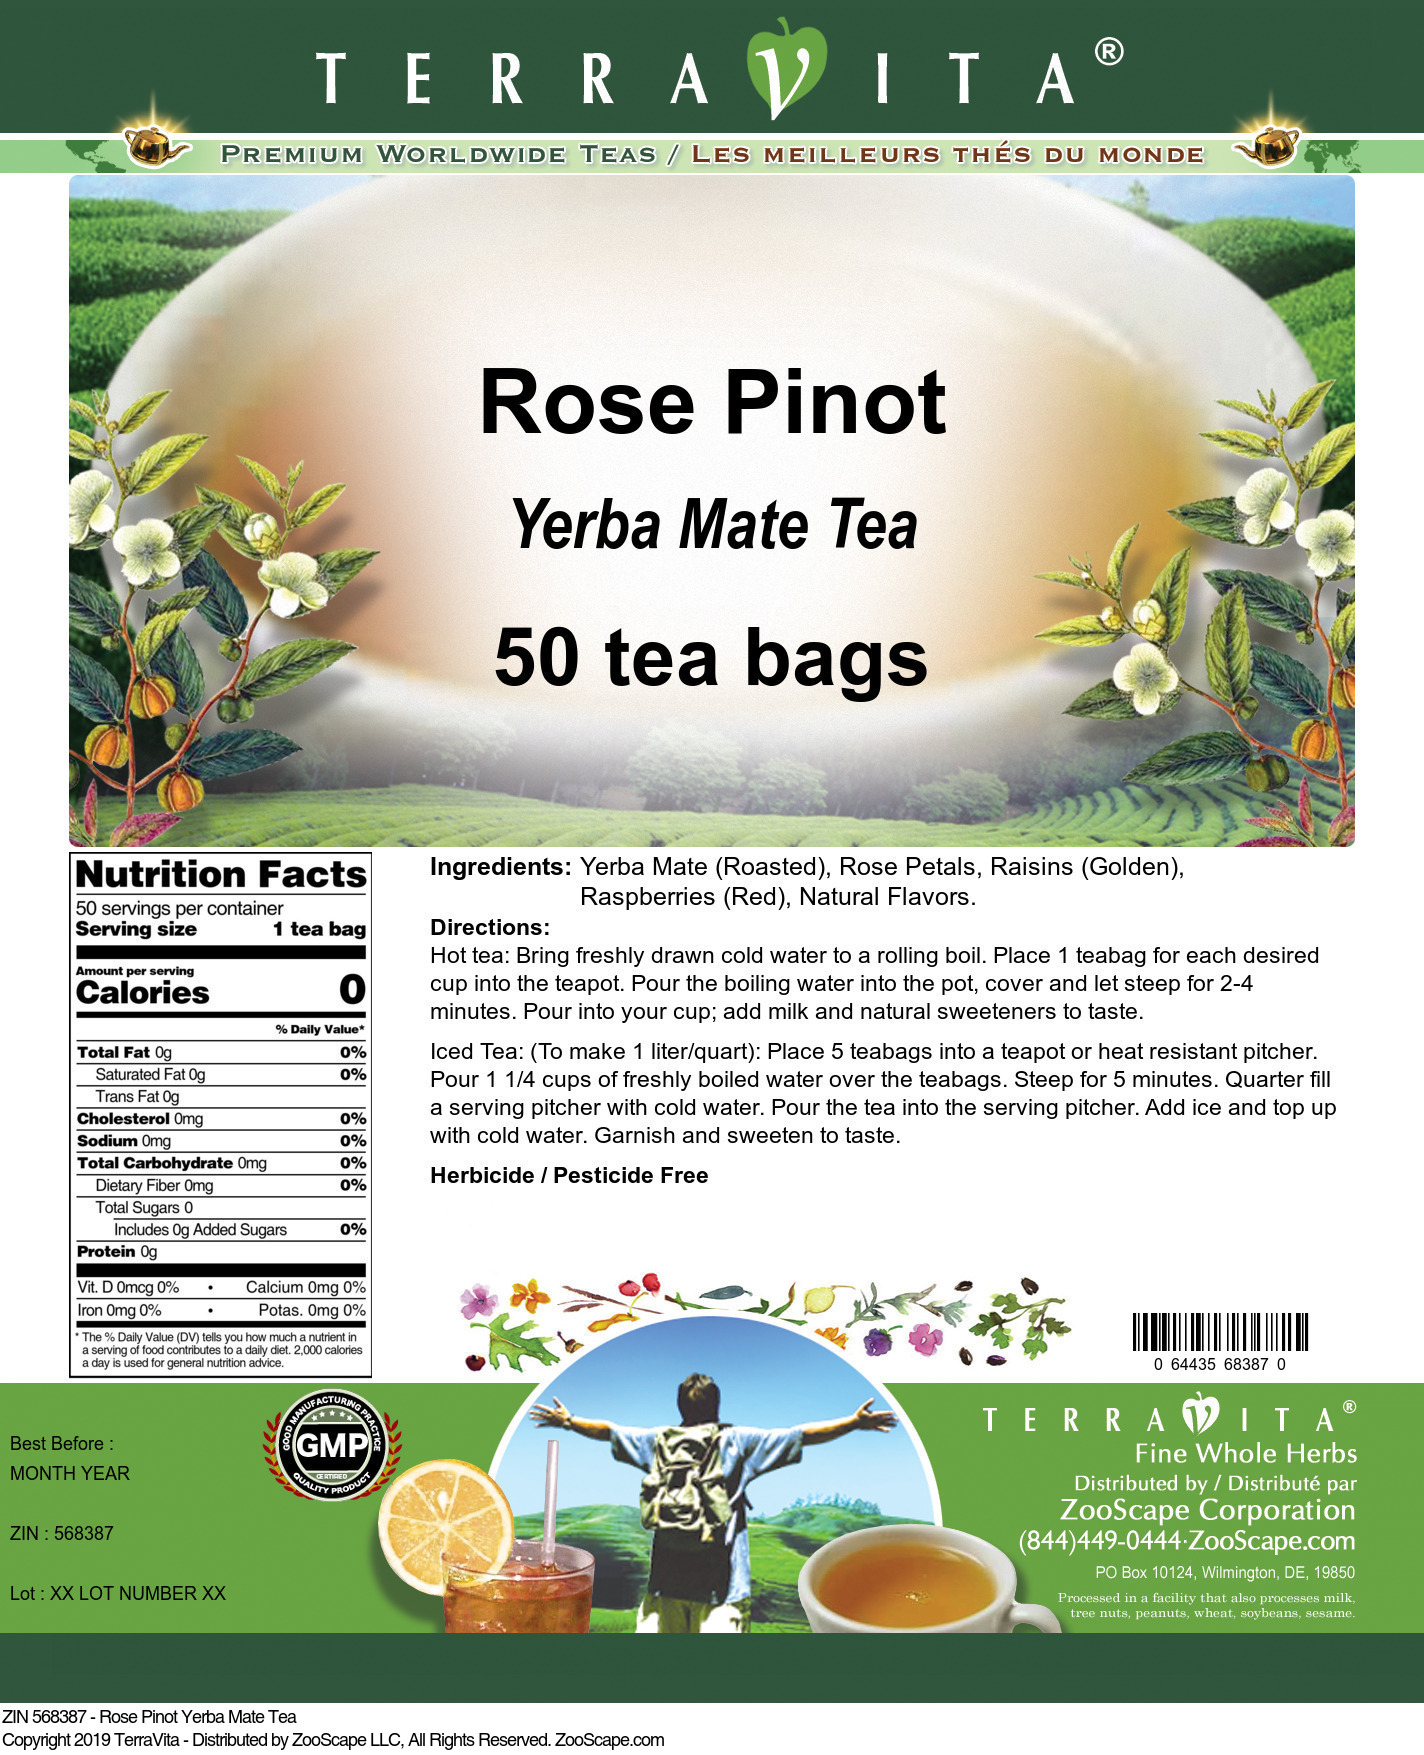 Rose Pinot Yerba Mate Tea